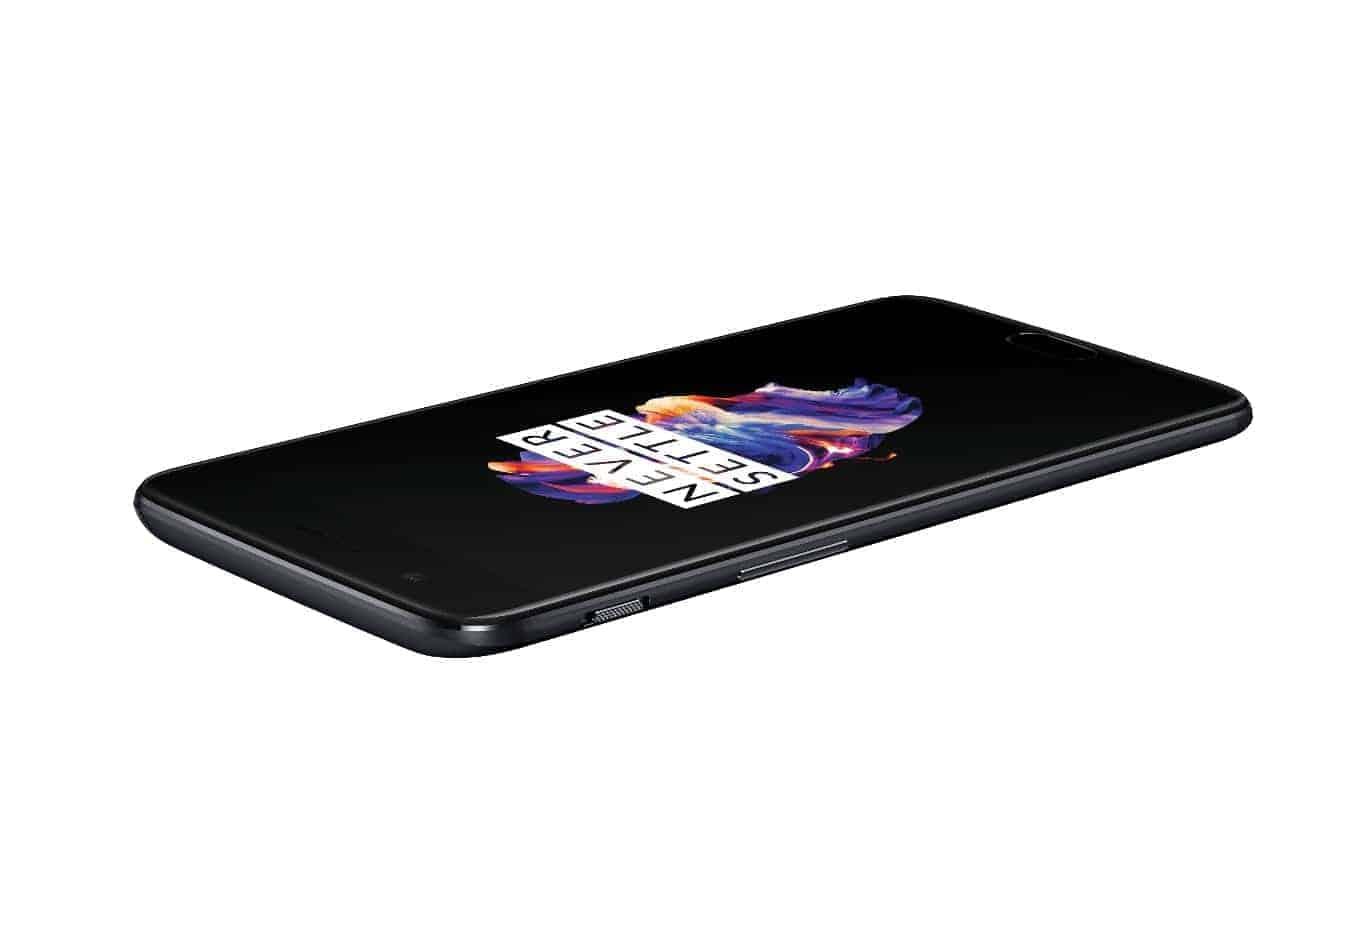 OnePlus 5 Slate Gray 8